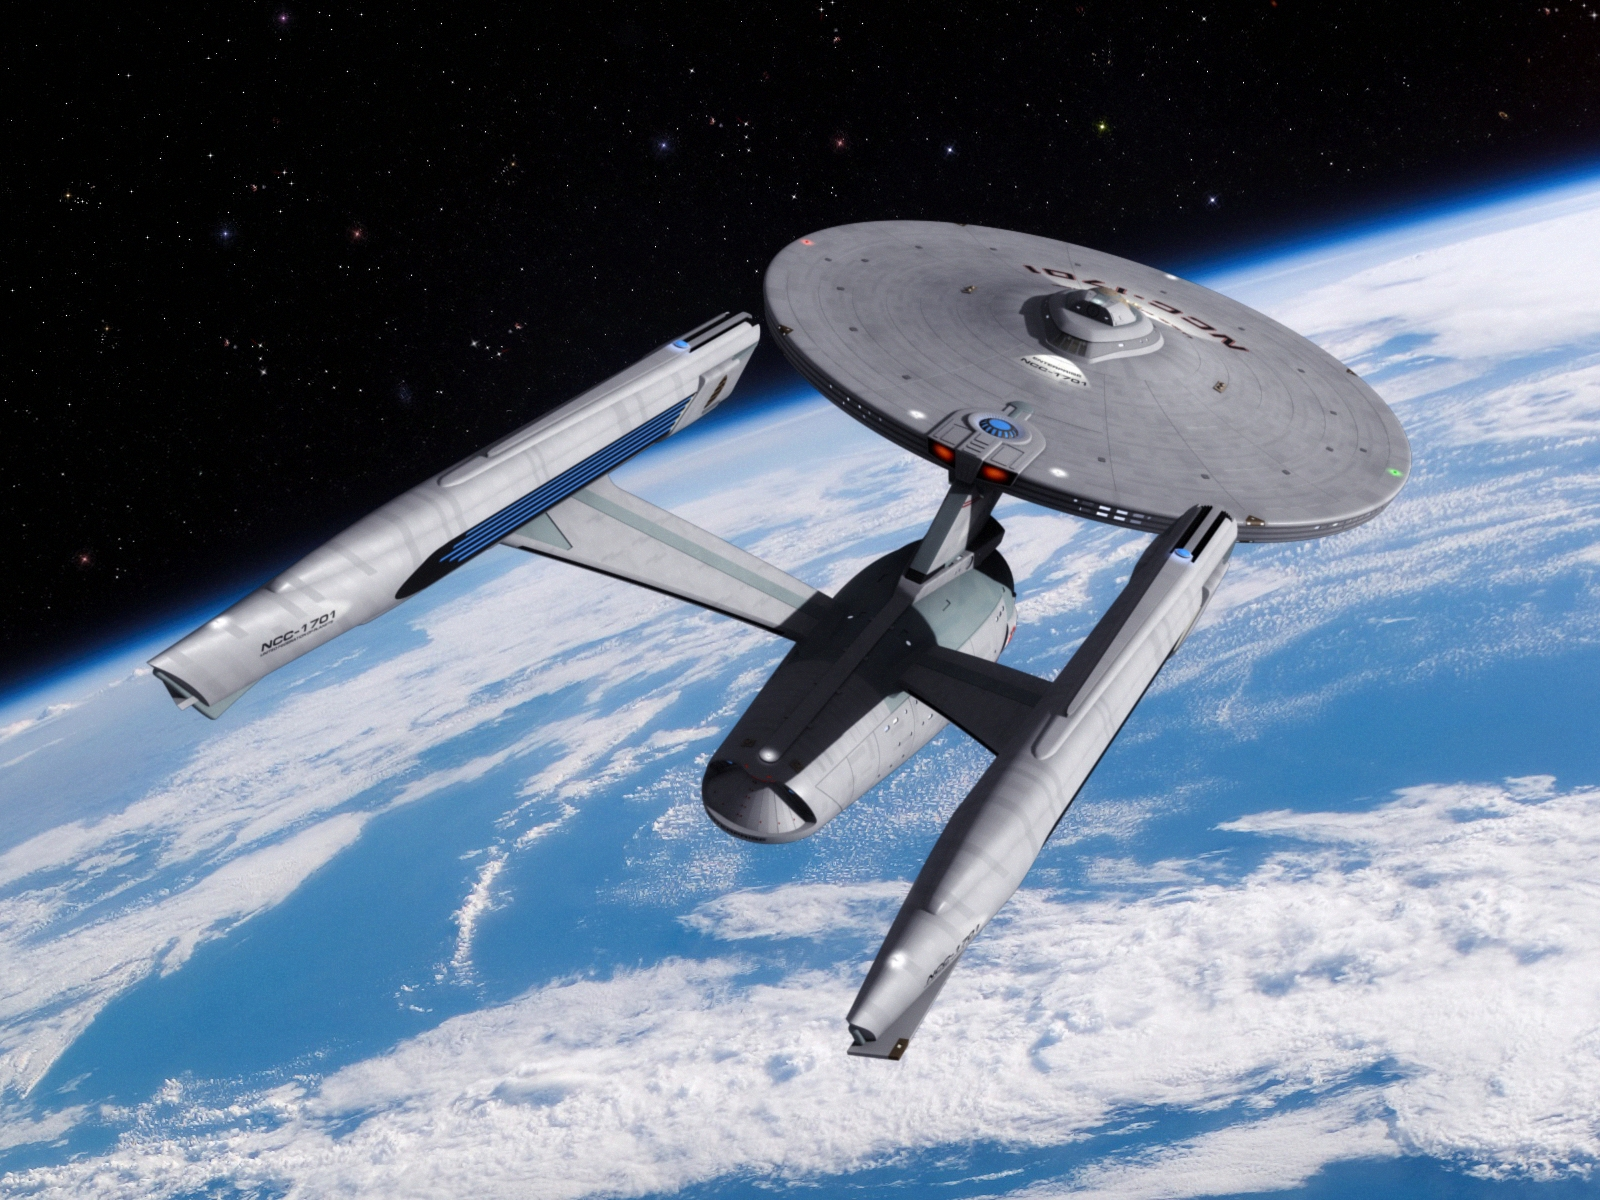 TMP Enterprise v3 by thefirstfleet